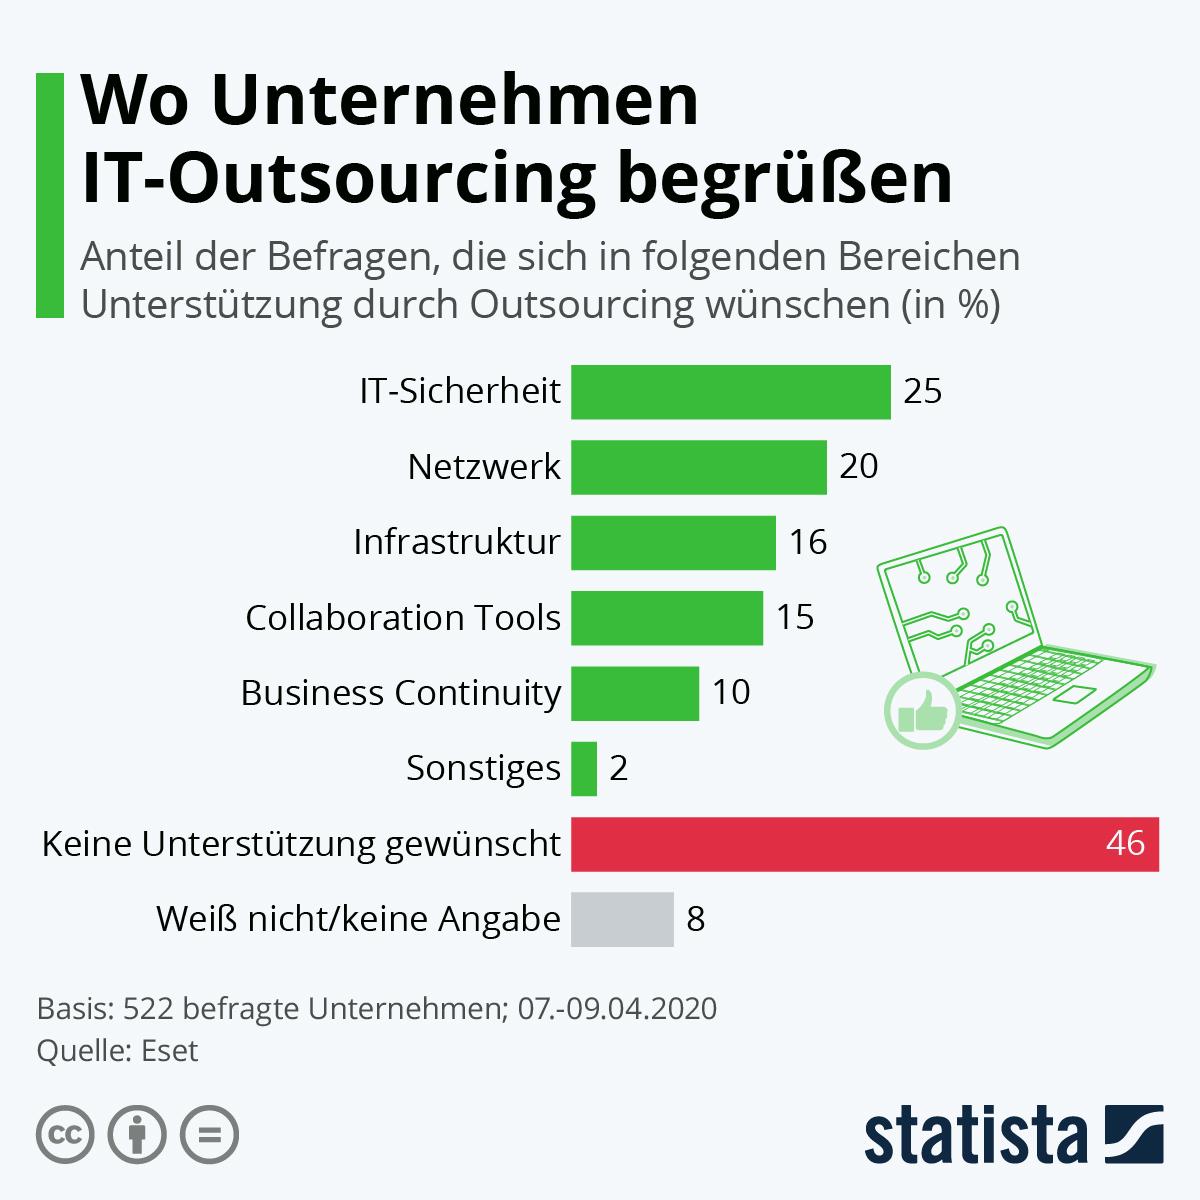 Infografik: Wo Unternehmen IT-Outsourcing begrüßen   Statista